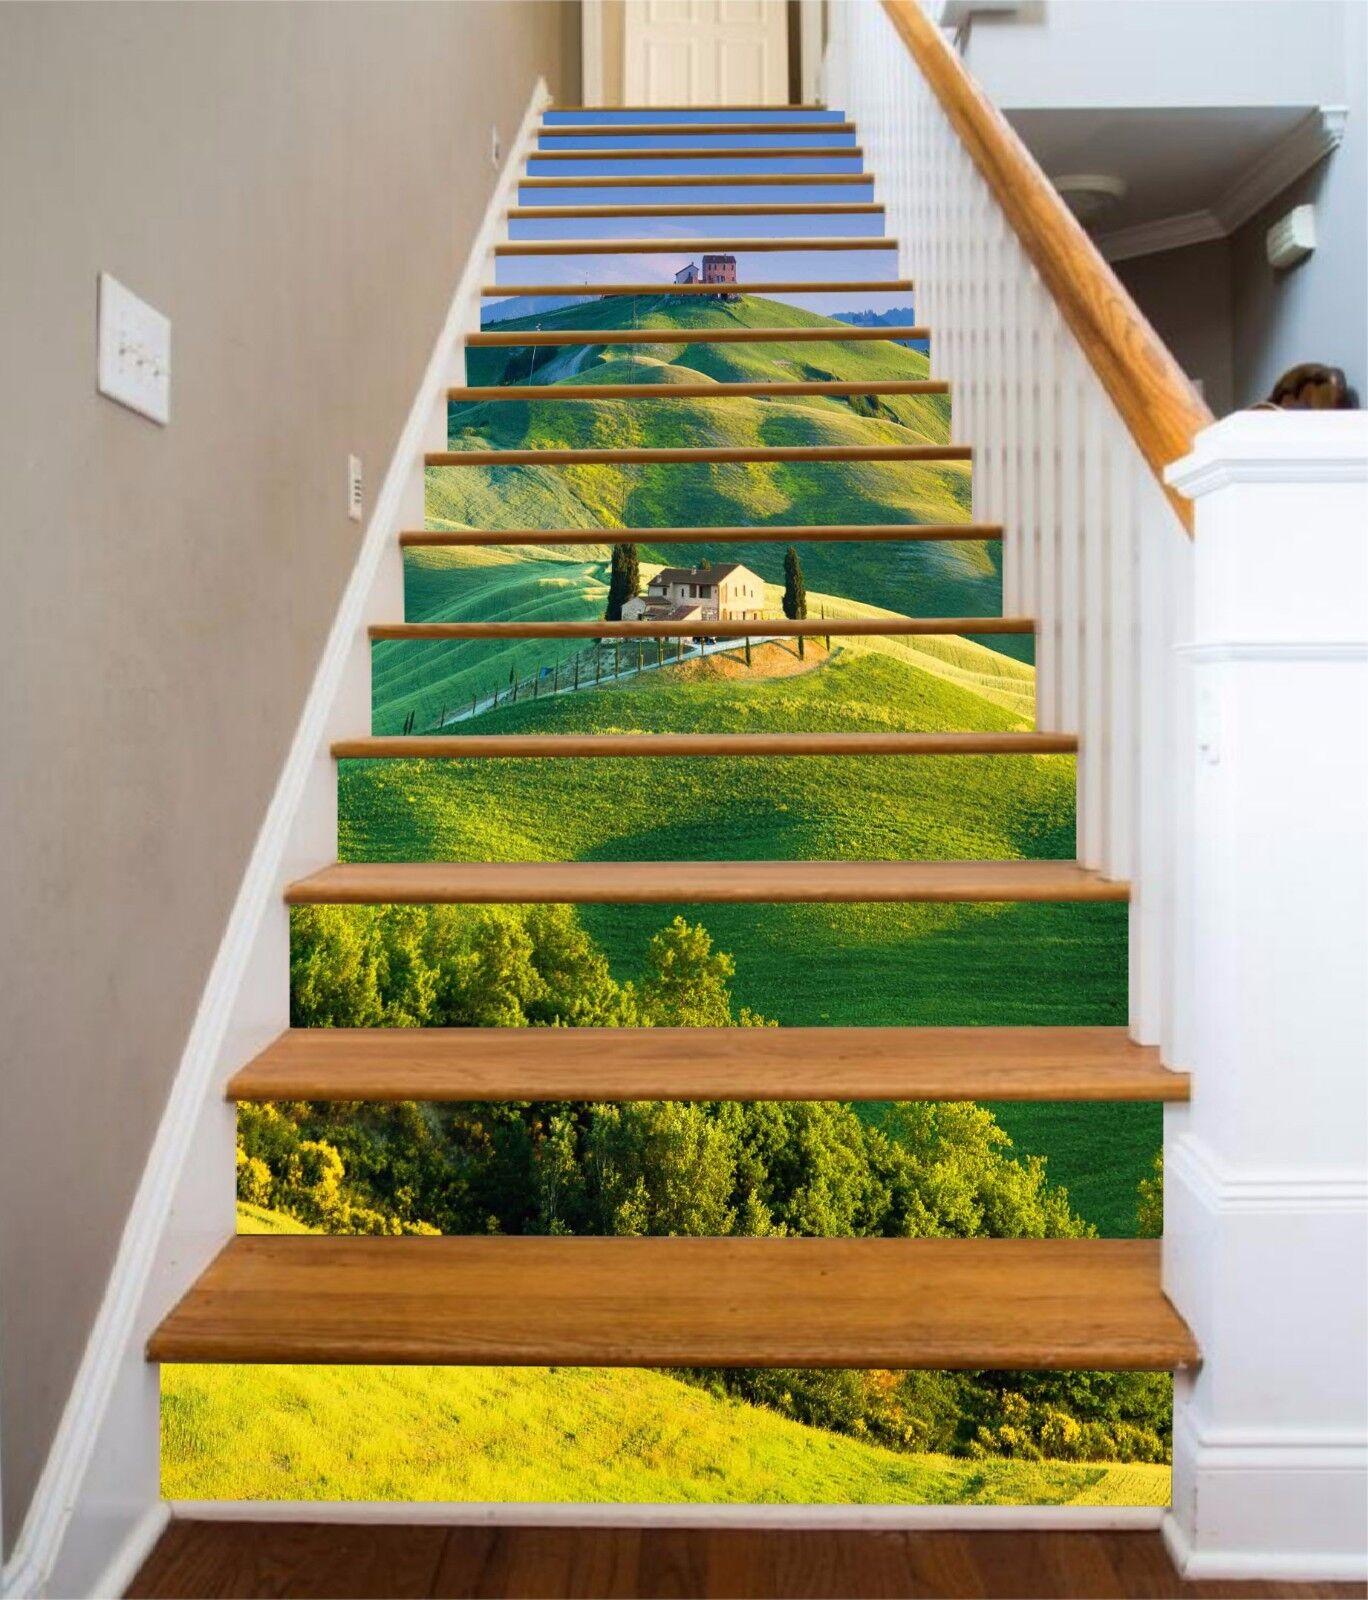 3D House Grassland 6374 Risers Decoration Photo Mural Vinyl Decal Wallpaper CA